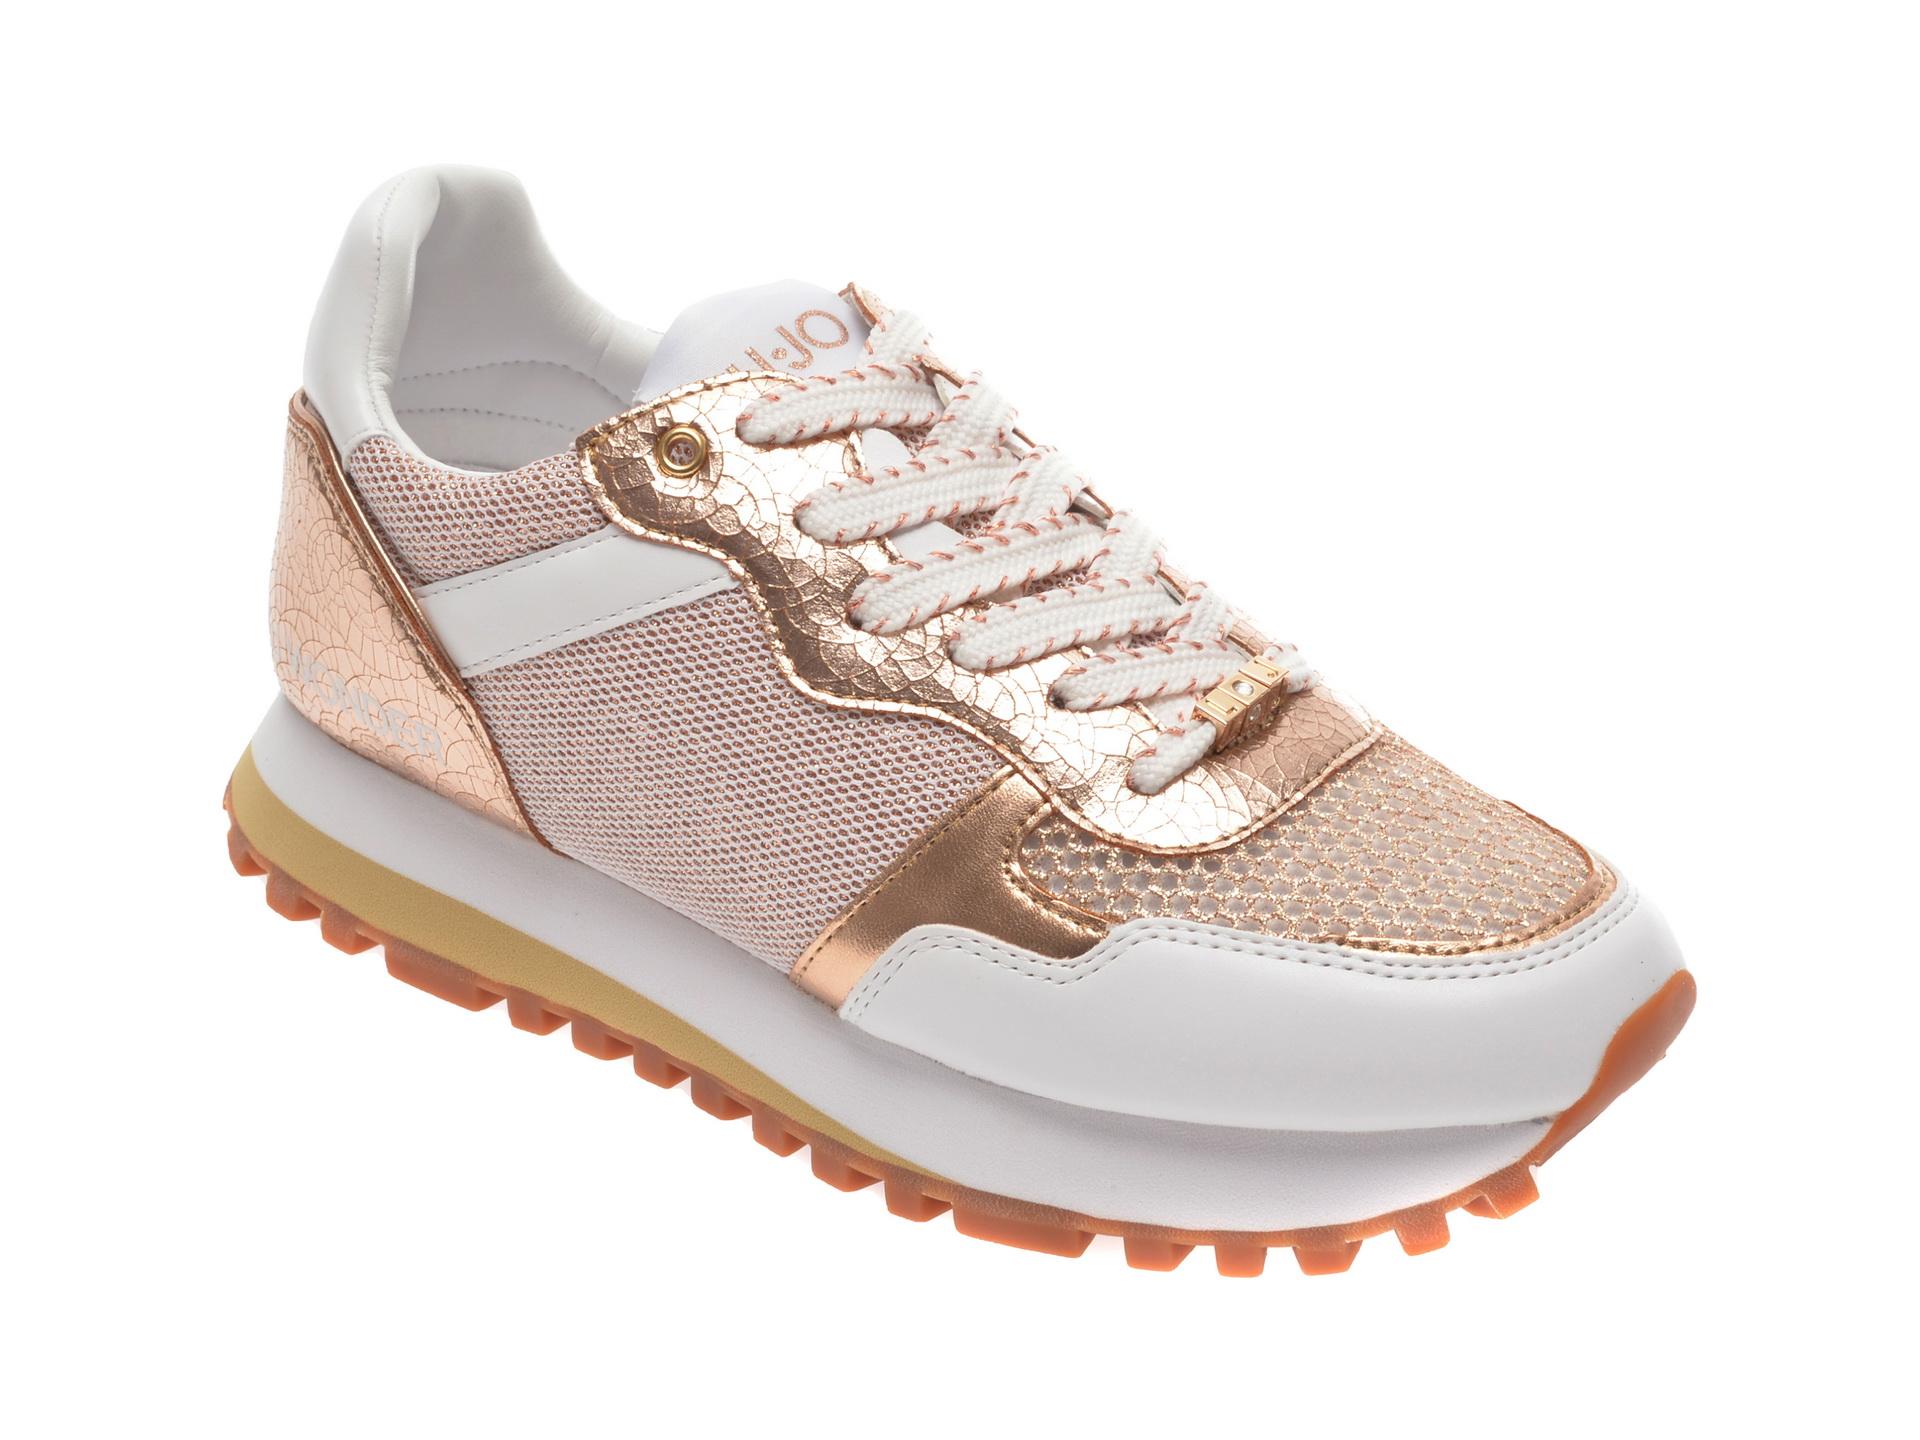 Pantofi sport LIU JO albi, Wonder, din material textil si piele ecologica